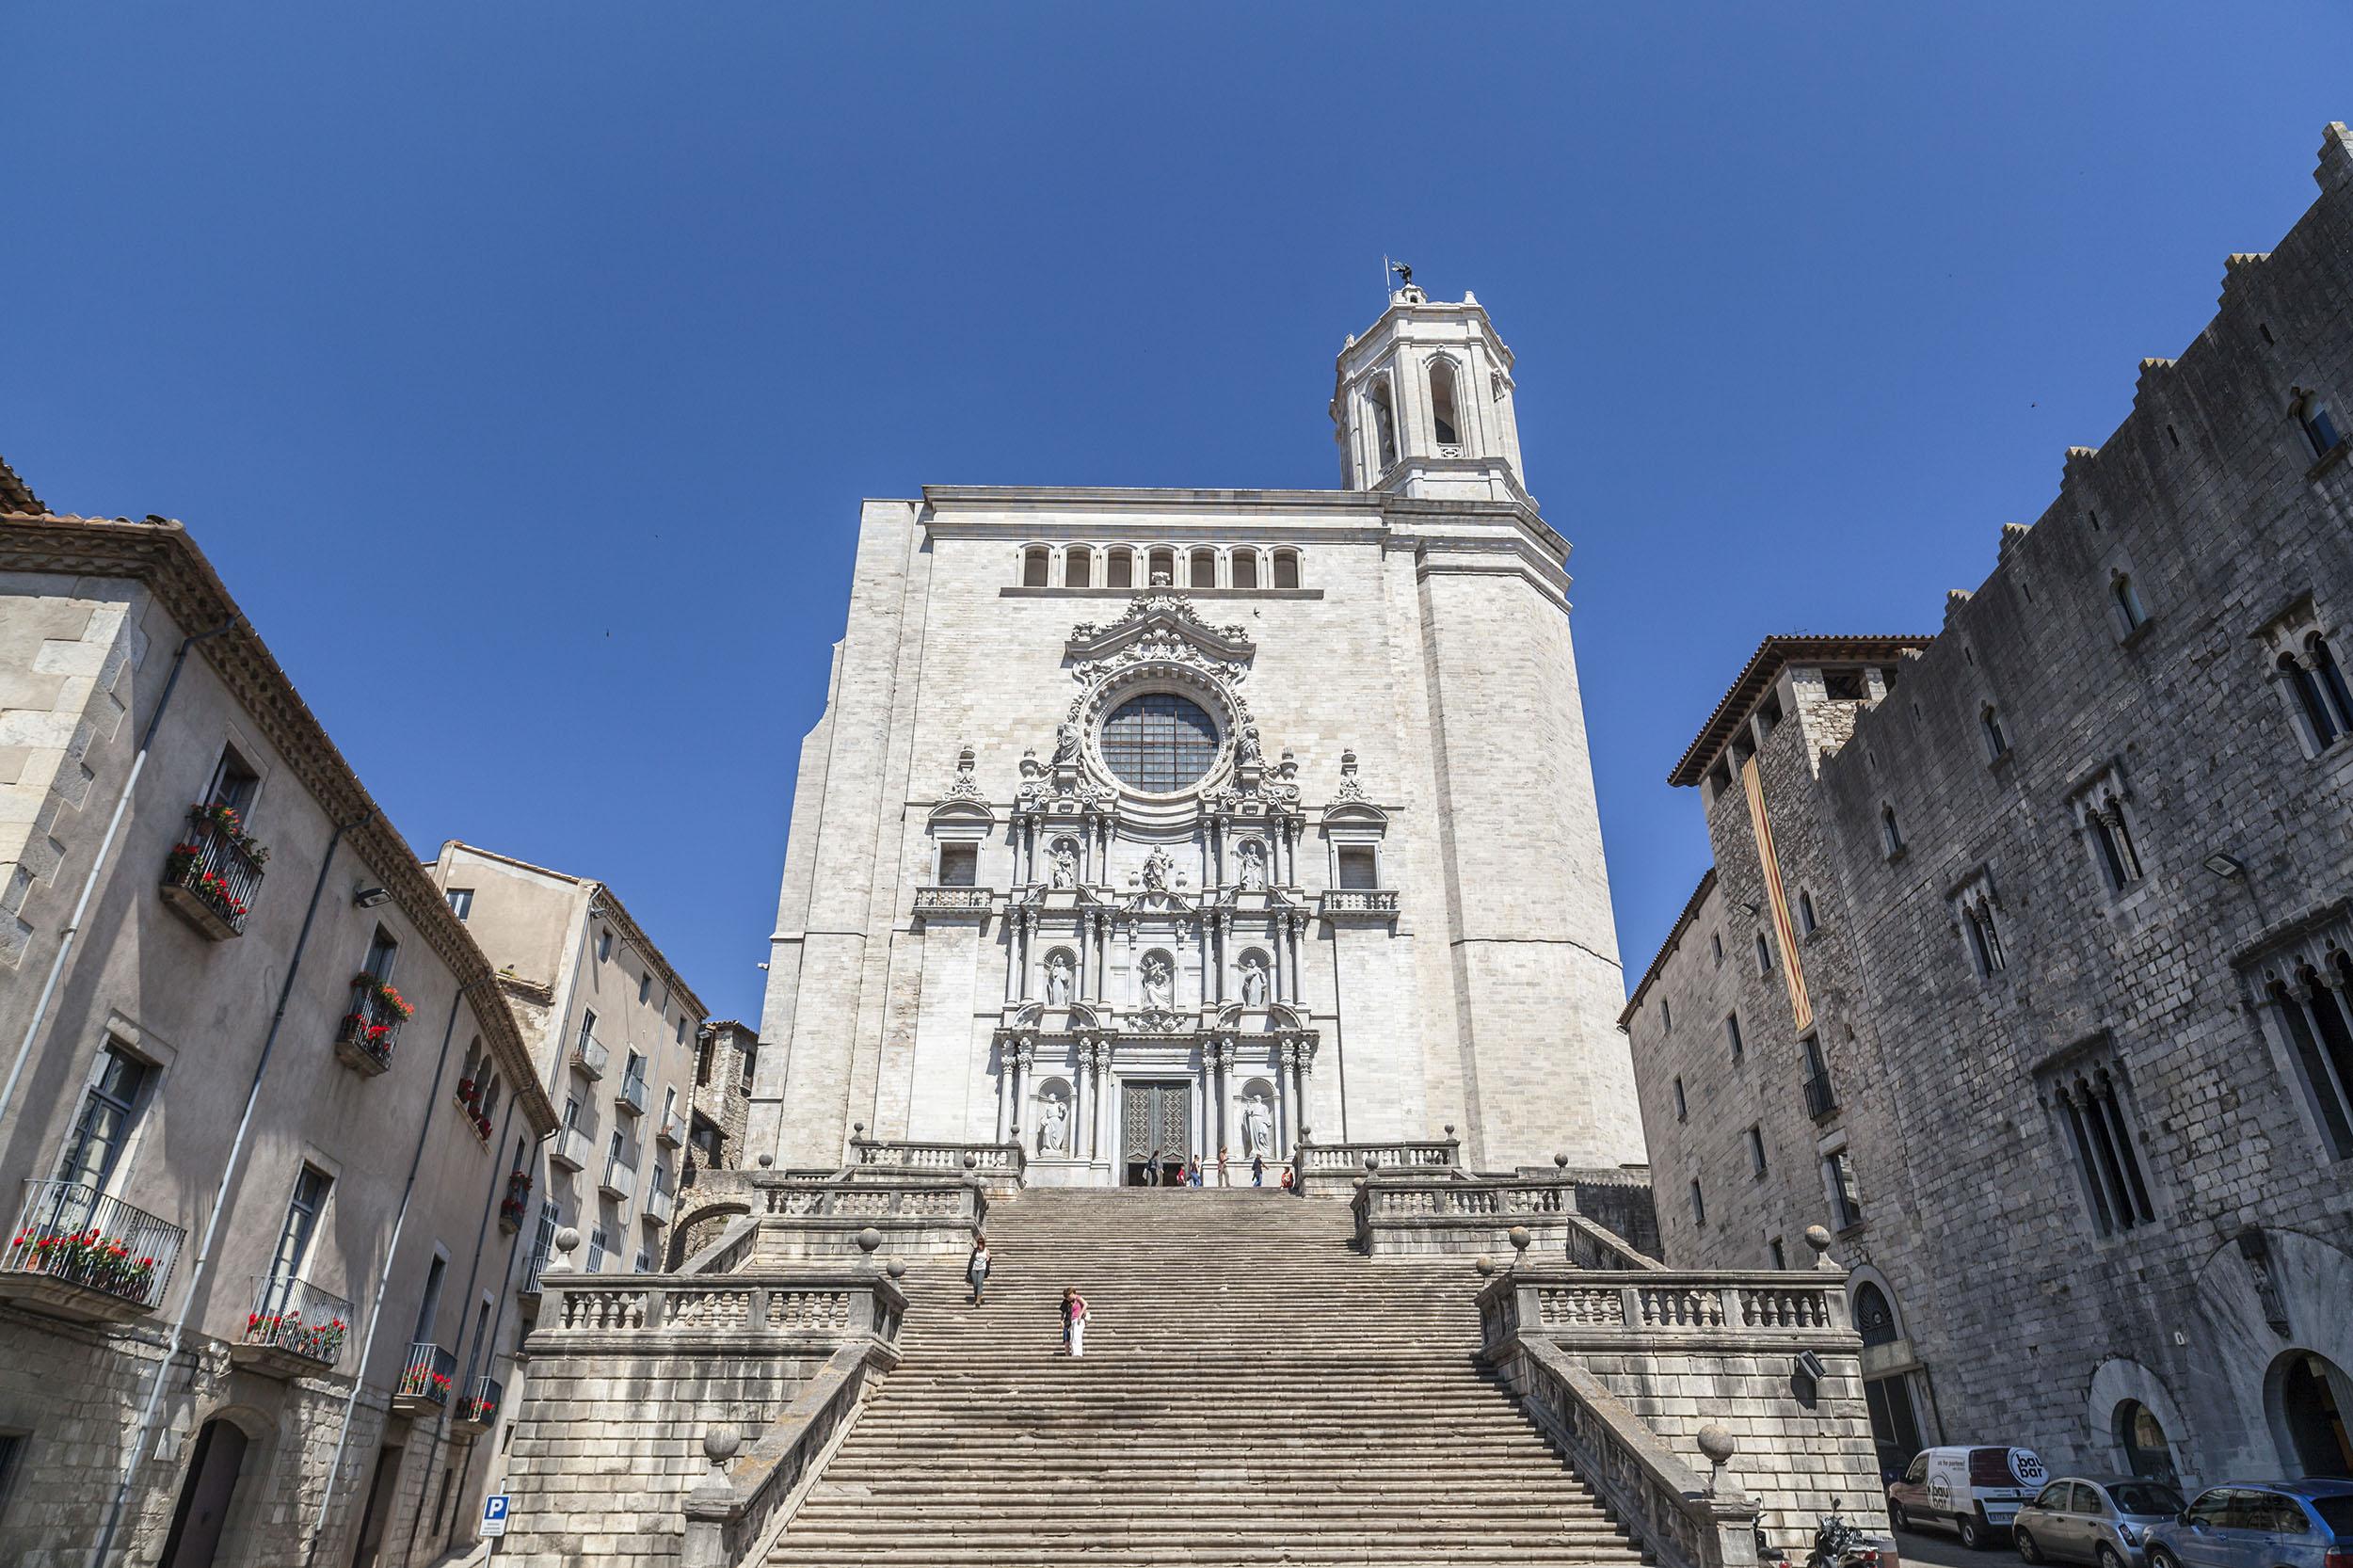 Girona Cathedral, Girona, Spain